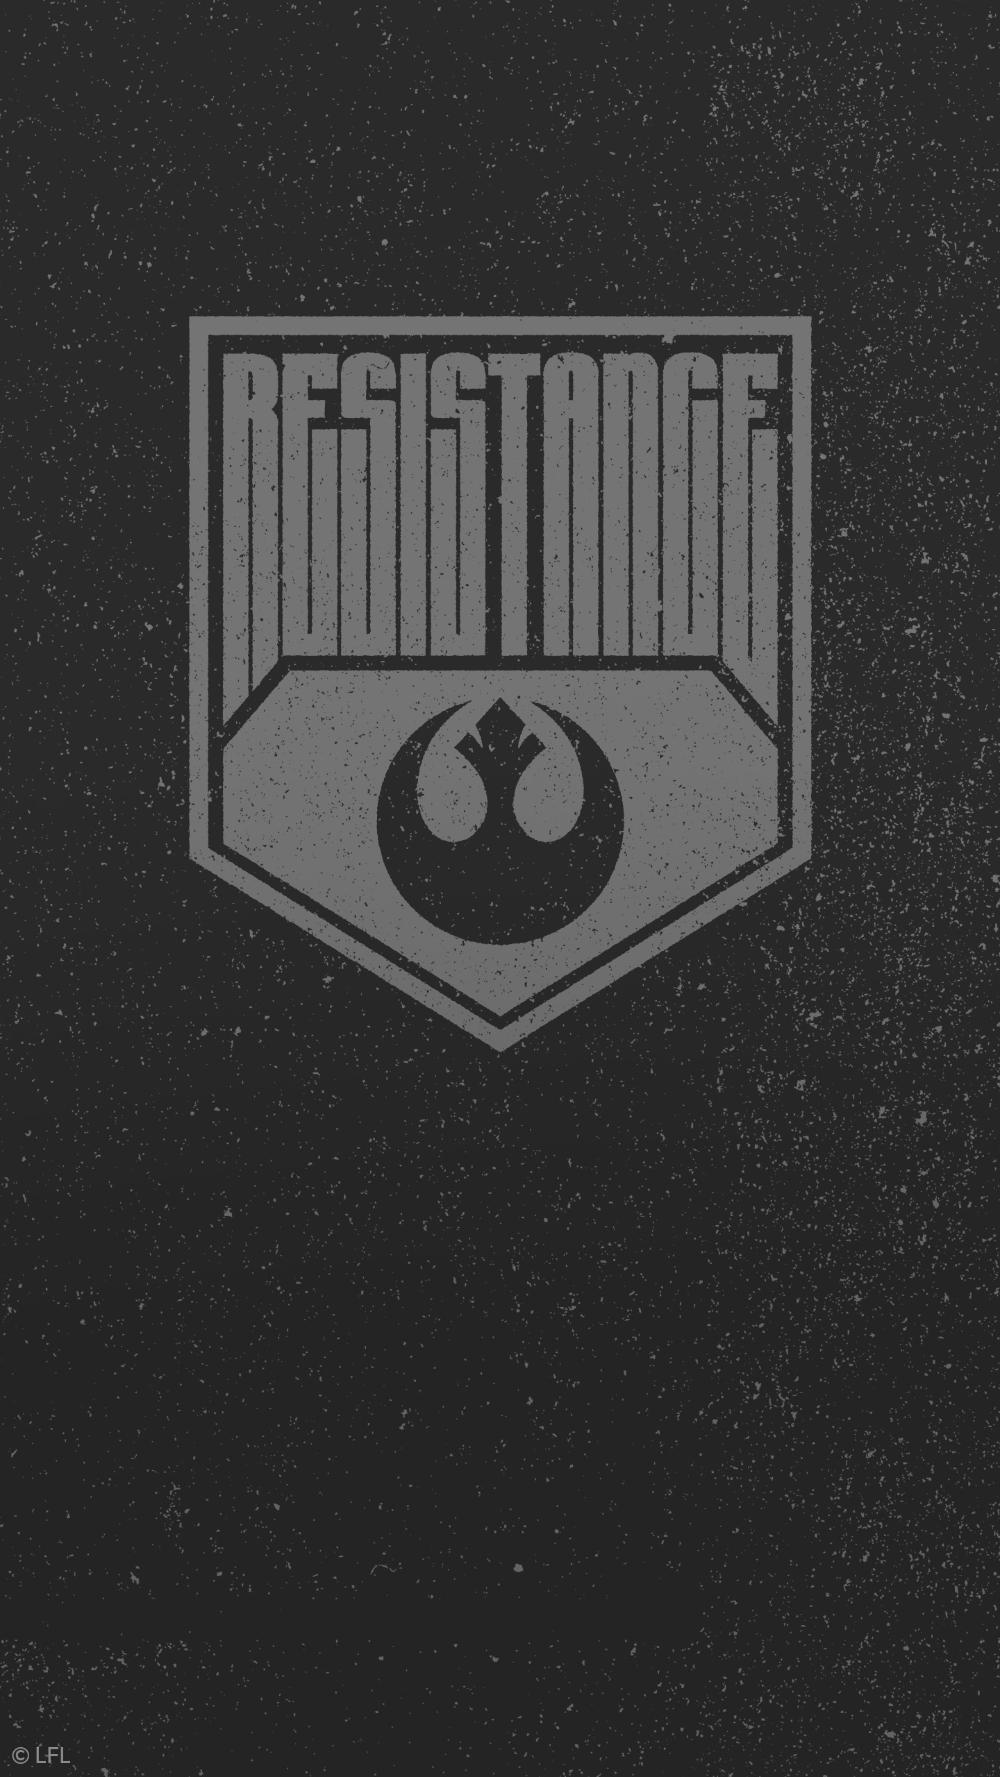 Star Wars Resistance Wallpapers Wallpaper Cave Star Wars Wallpaper Iphone Wallpaper Stars Android Wallpaper